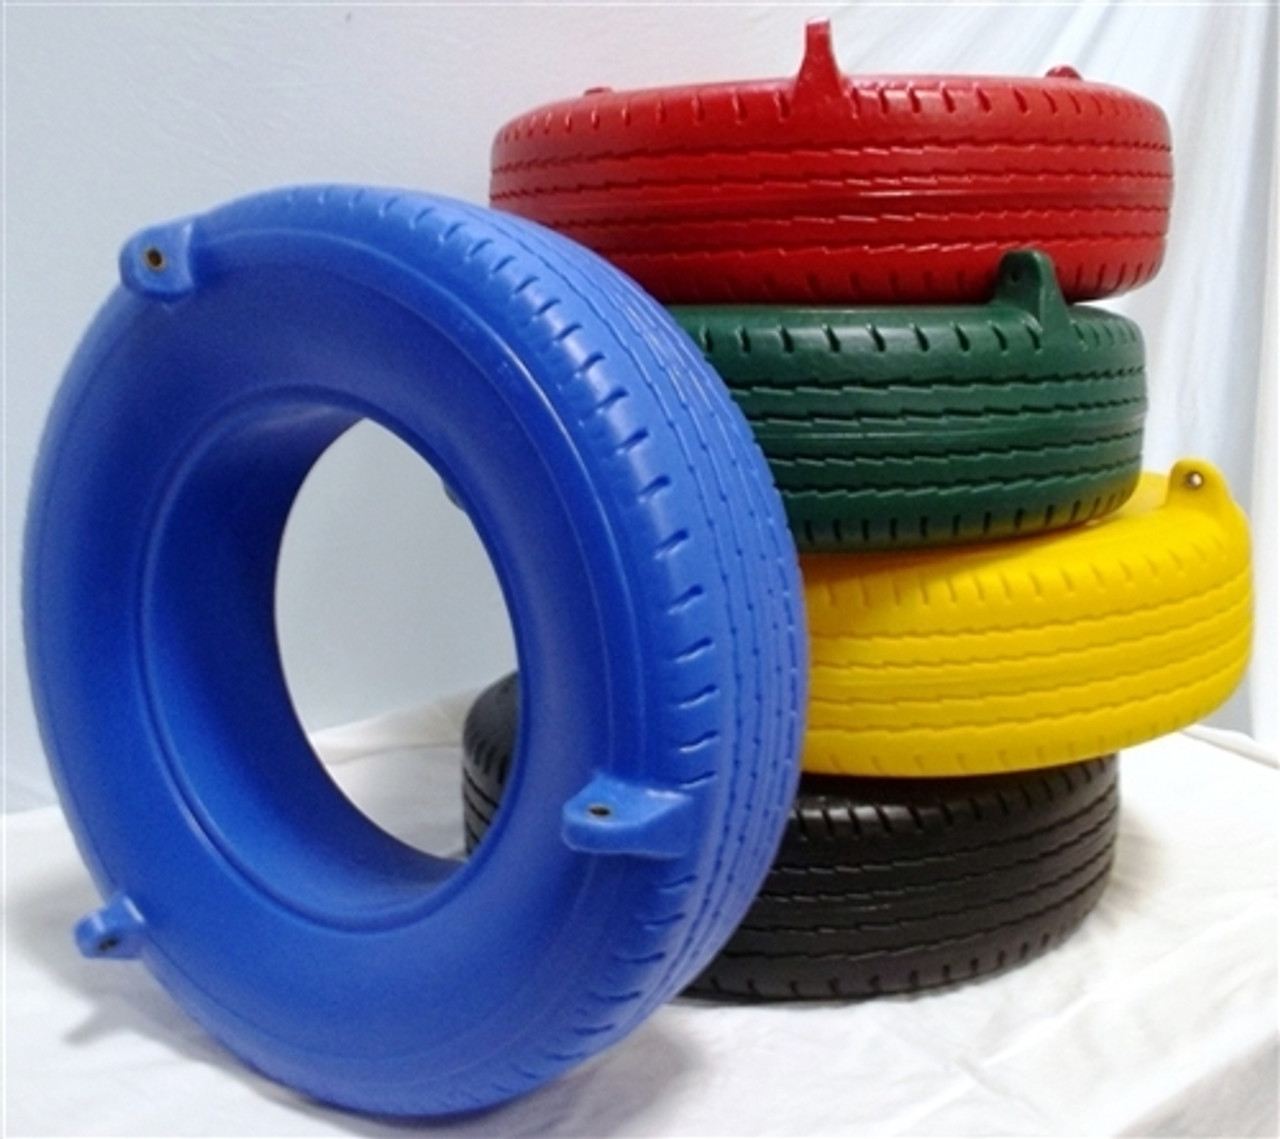 Roto-Molded Tire Swing